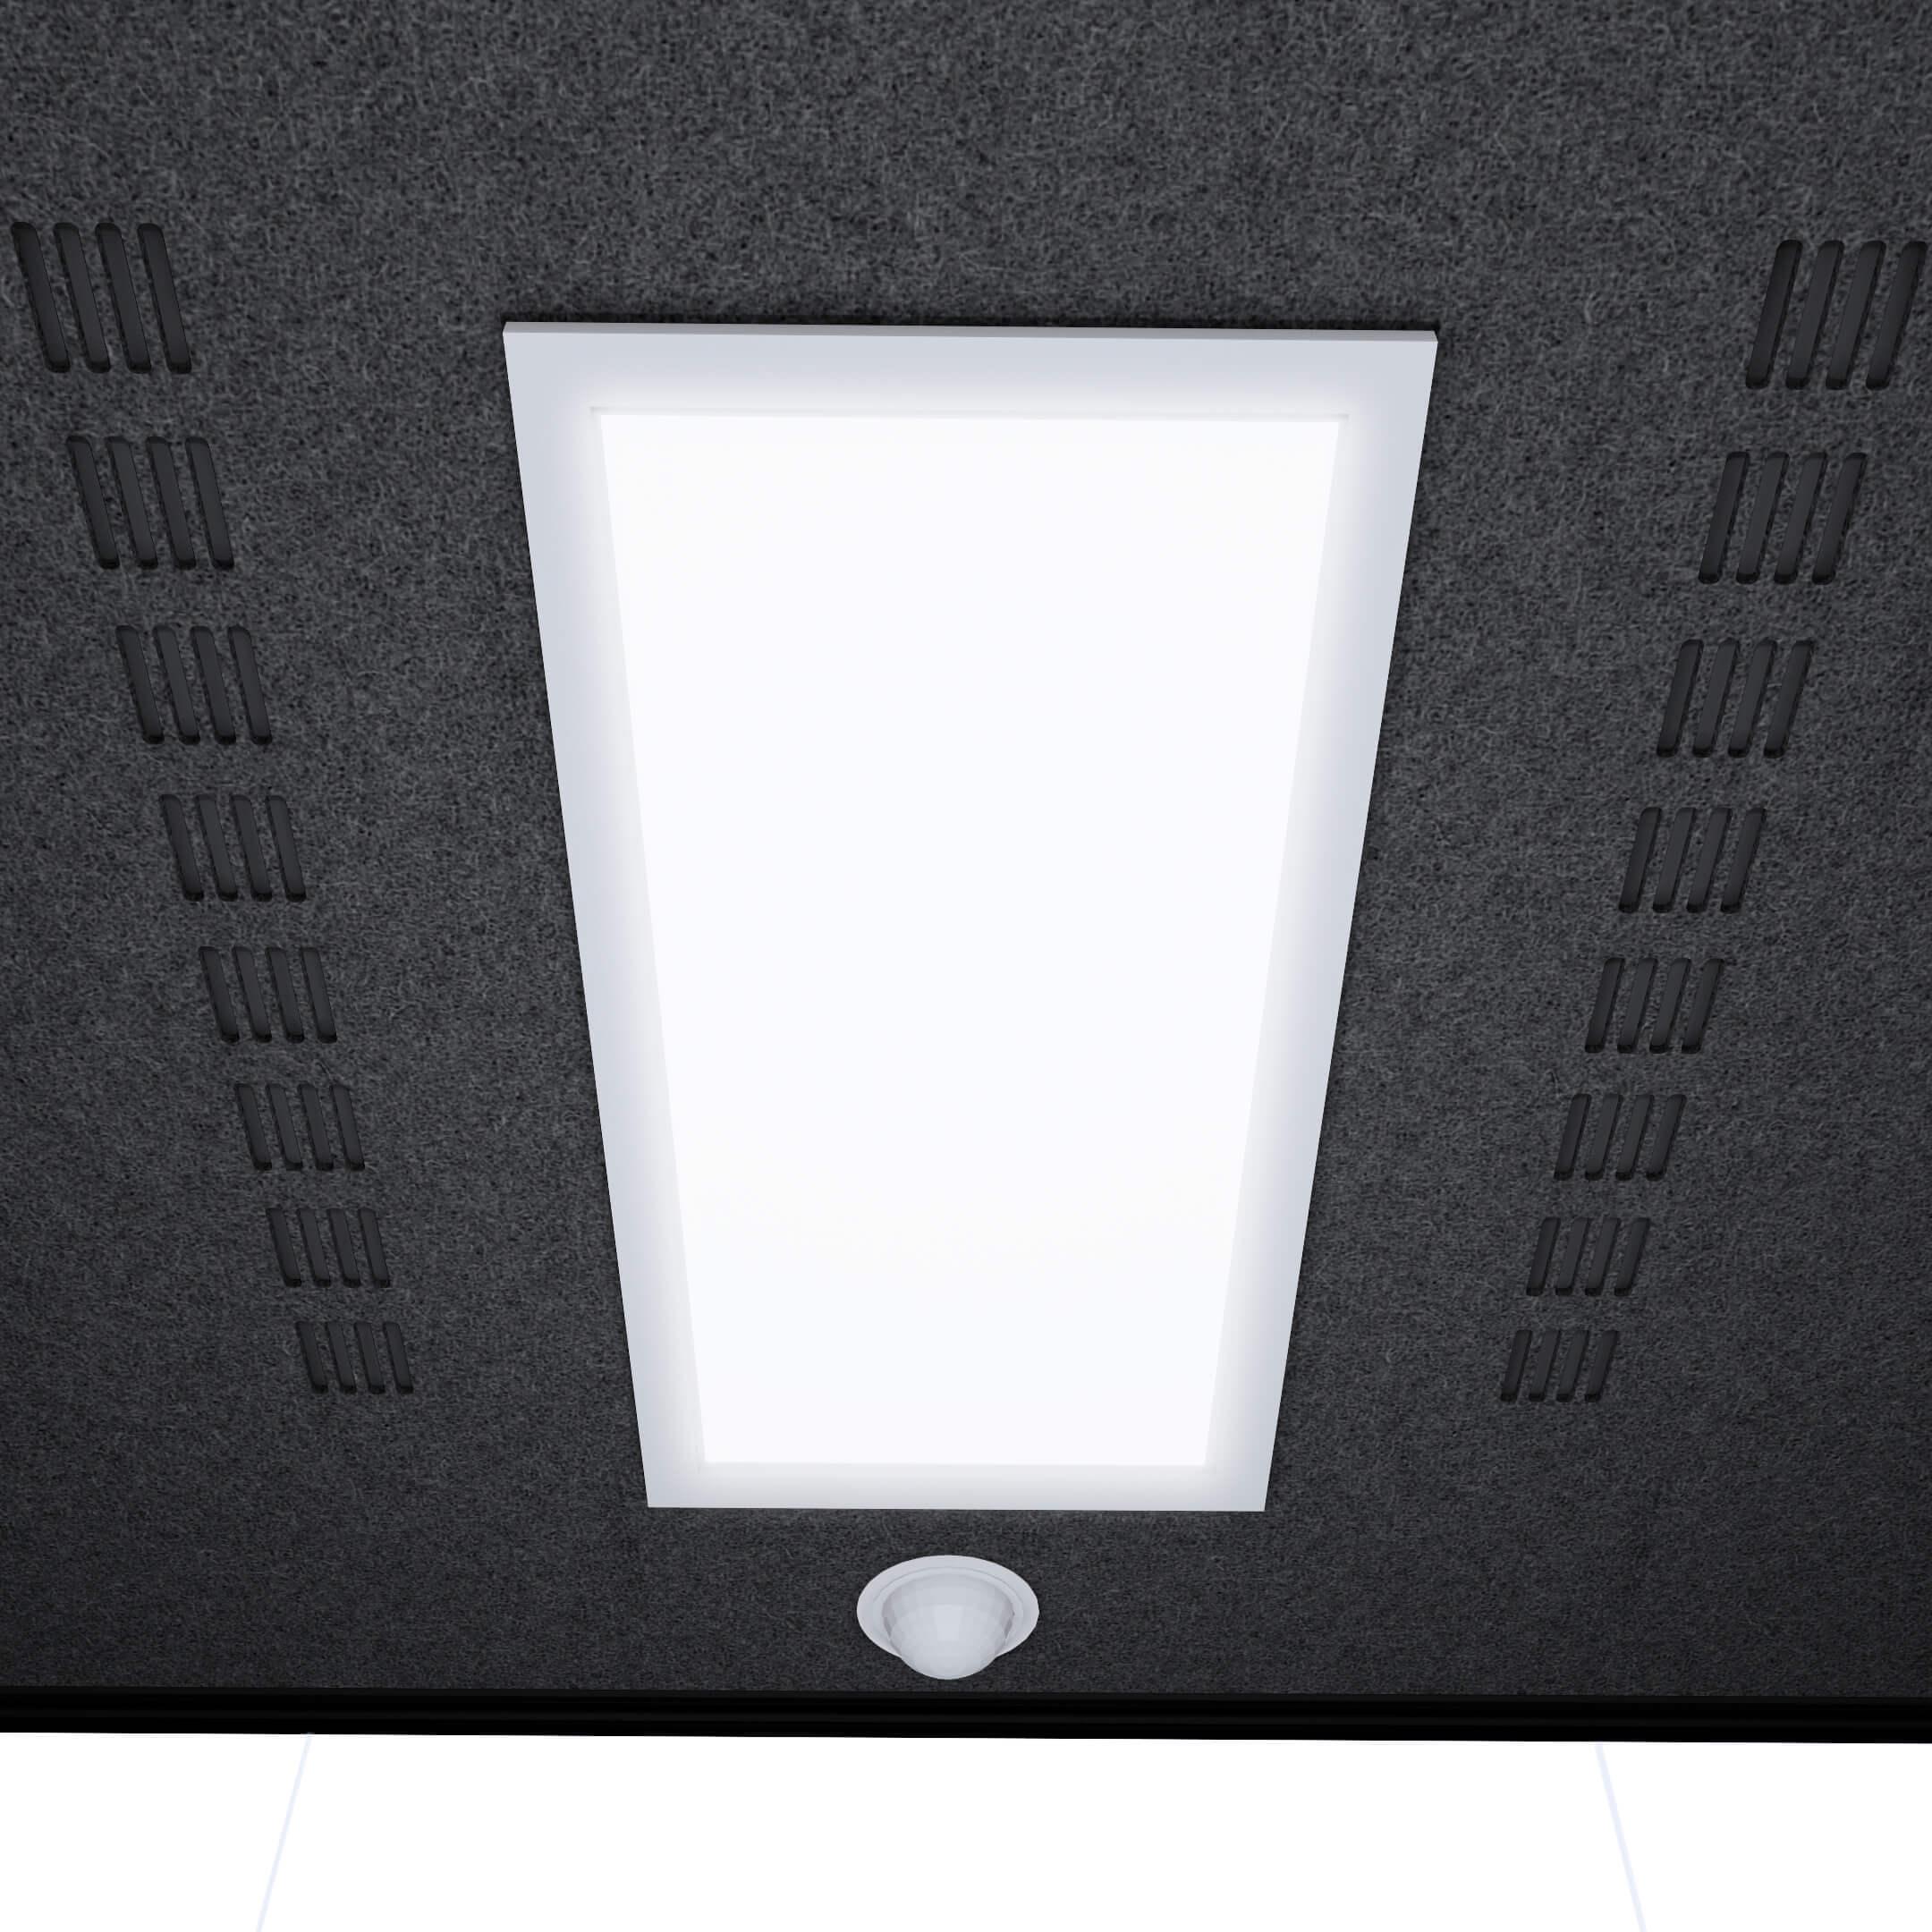 CHATBOX QUATTRO-LIGHT AND MOTION SENSOR